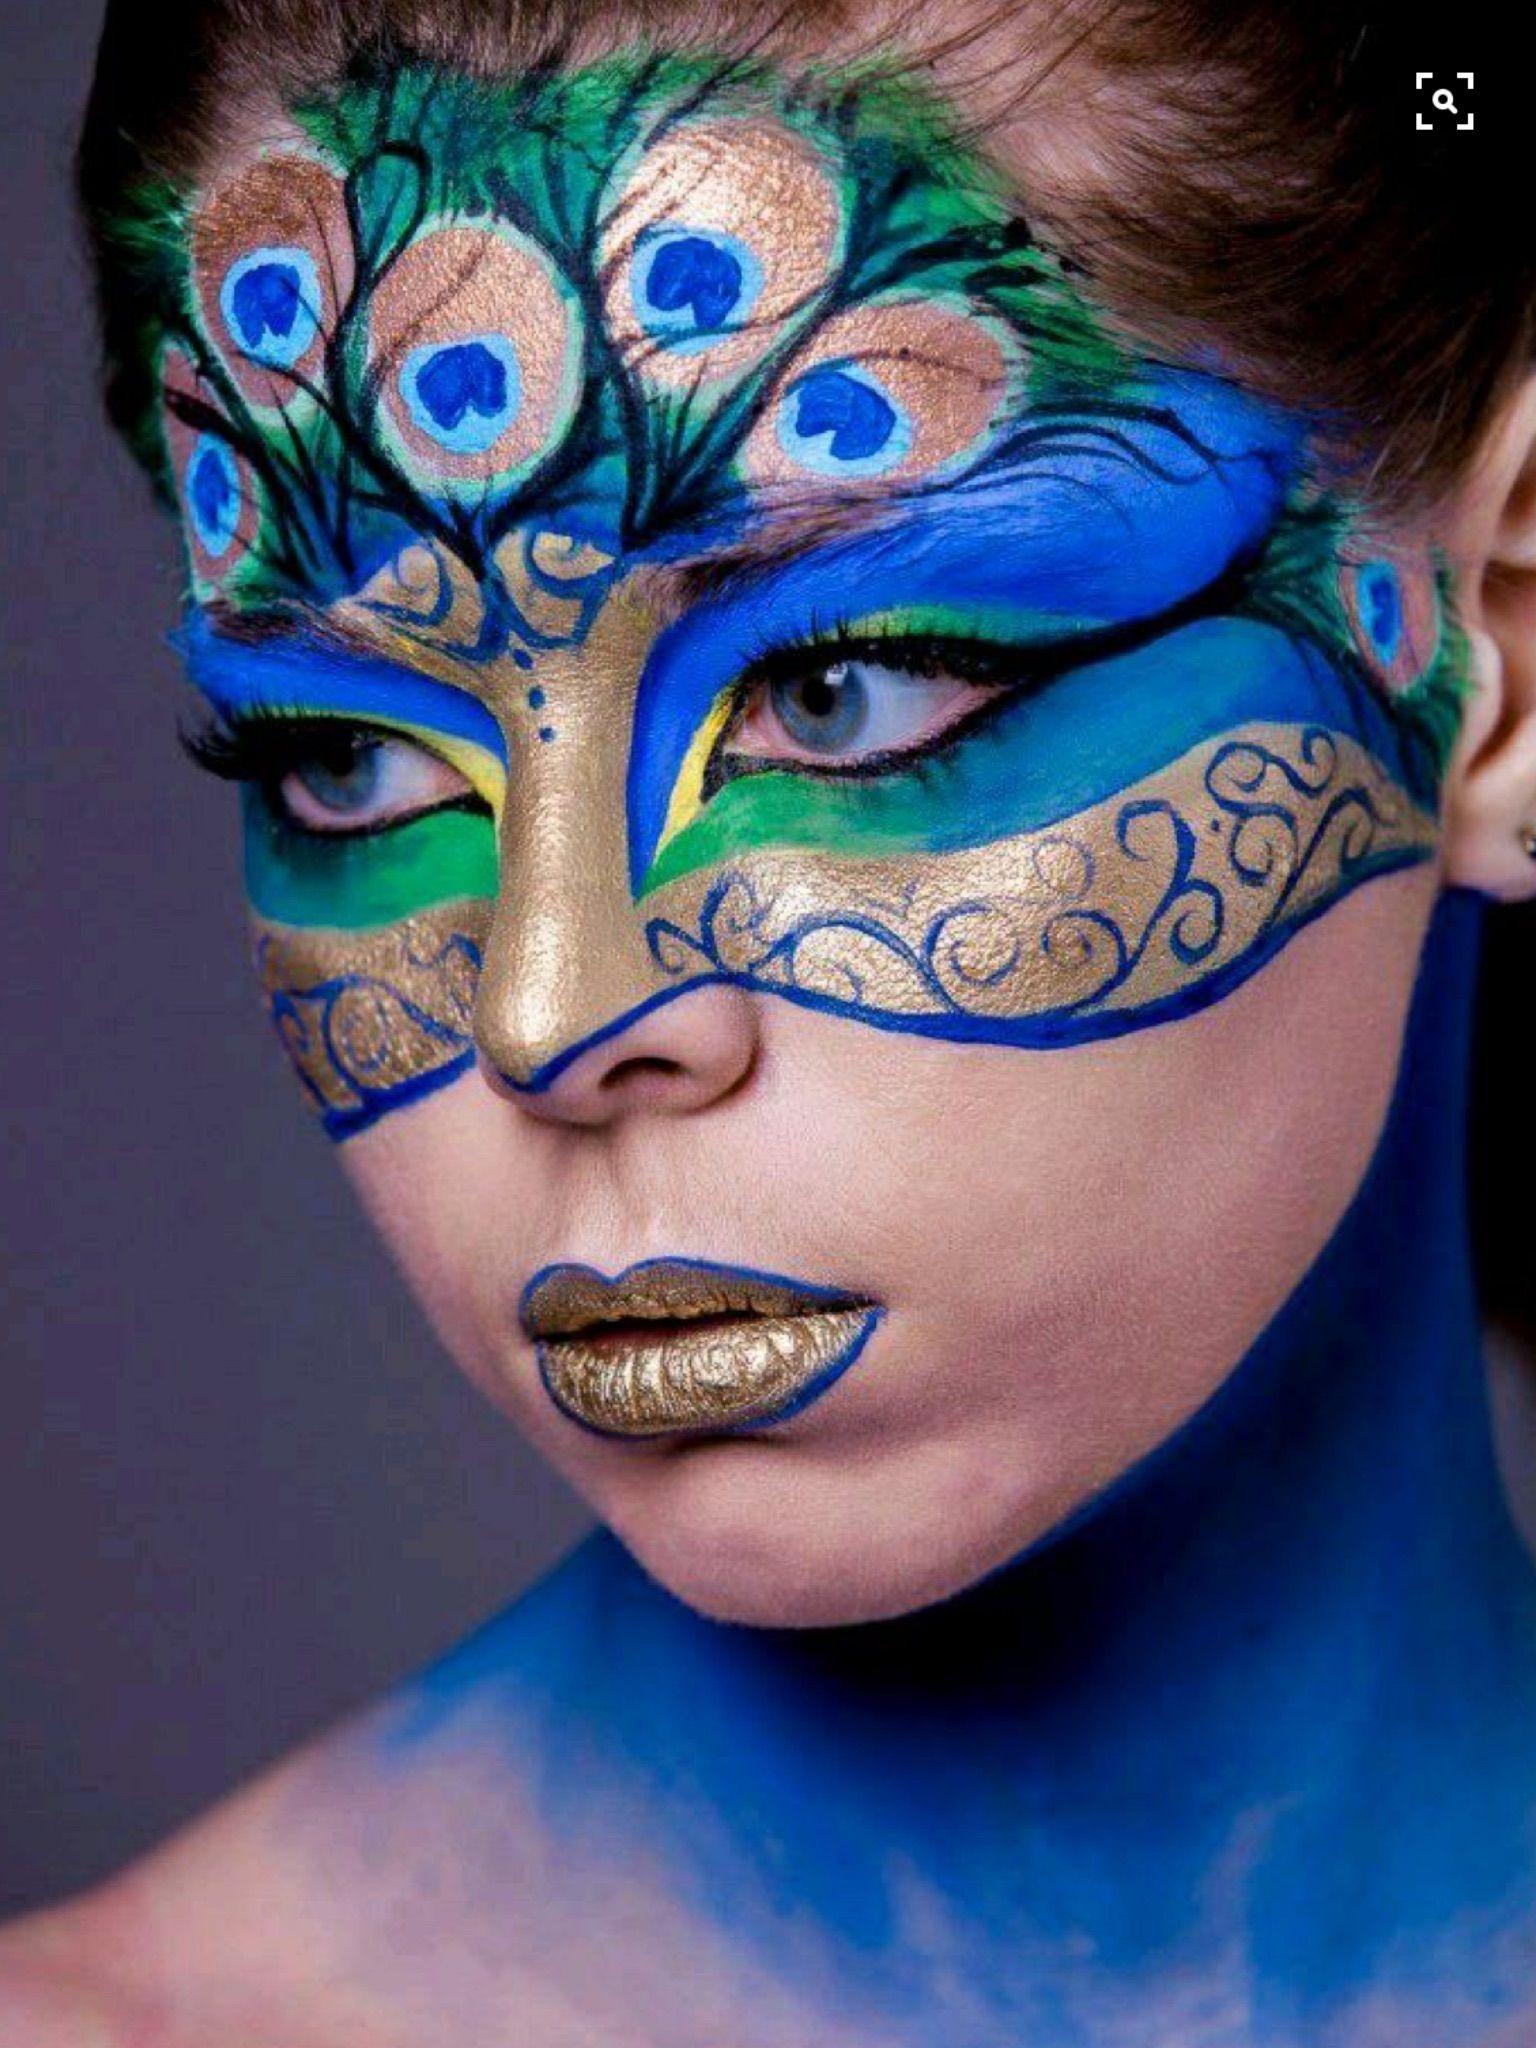 peacock circus makeup makeup pinterest gesicht schminken make up und karneval schminken. Black Bedroom Furniture Sets. Home Design Ideas